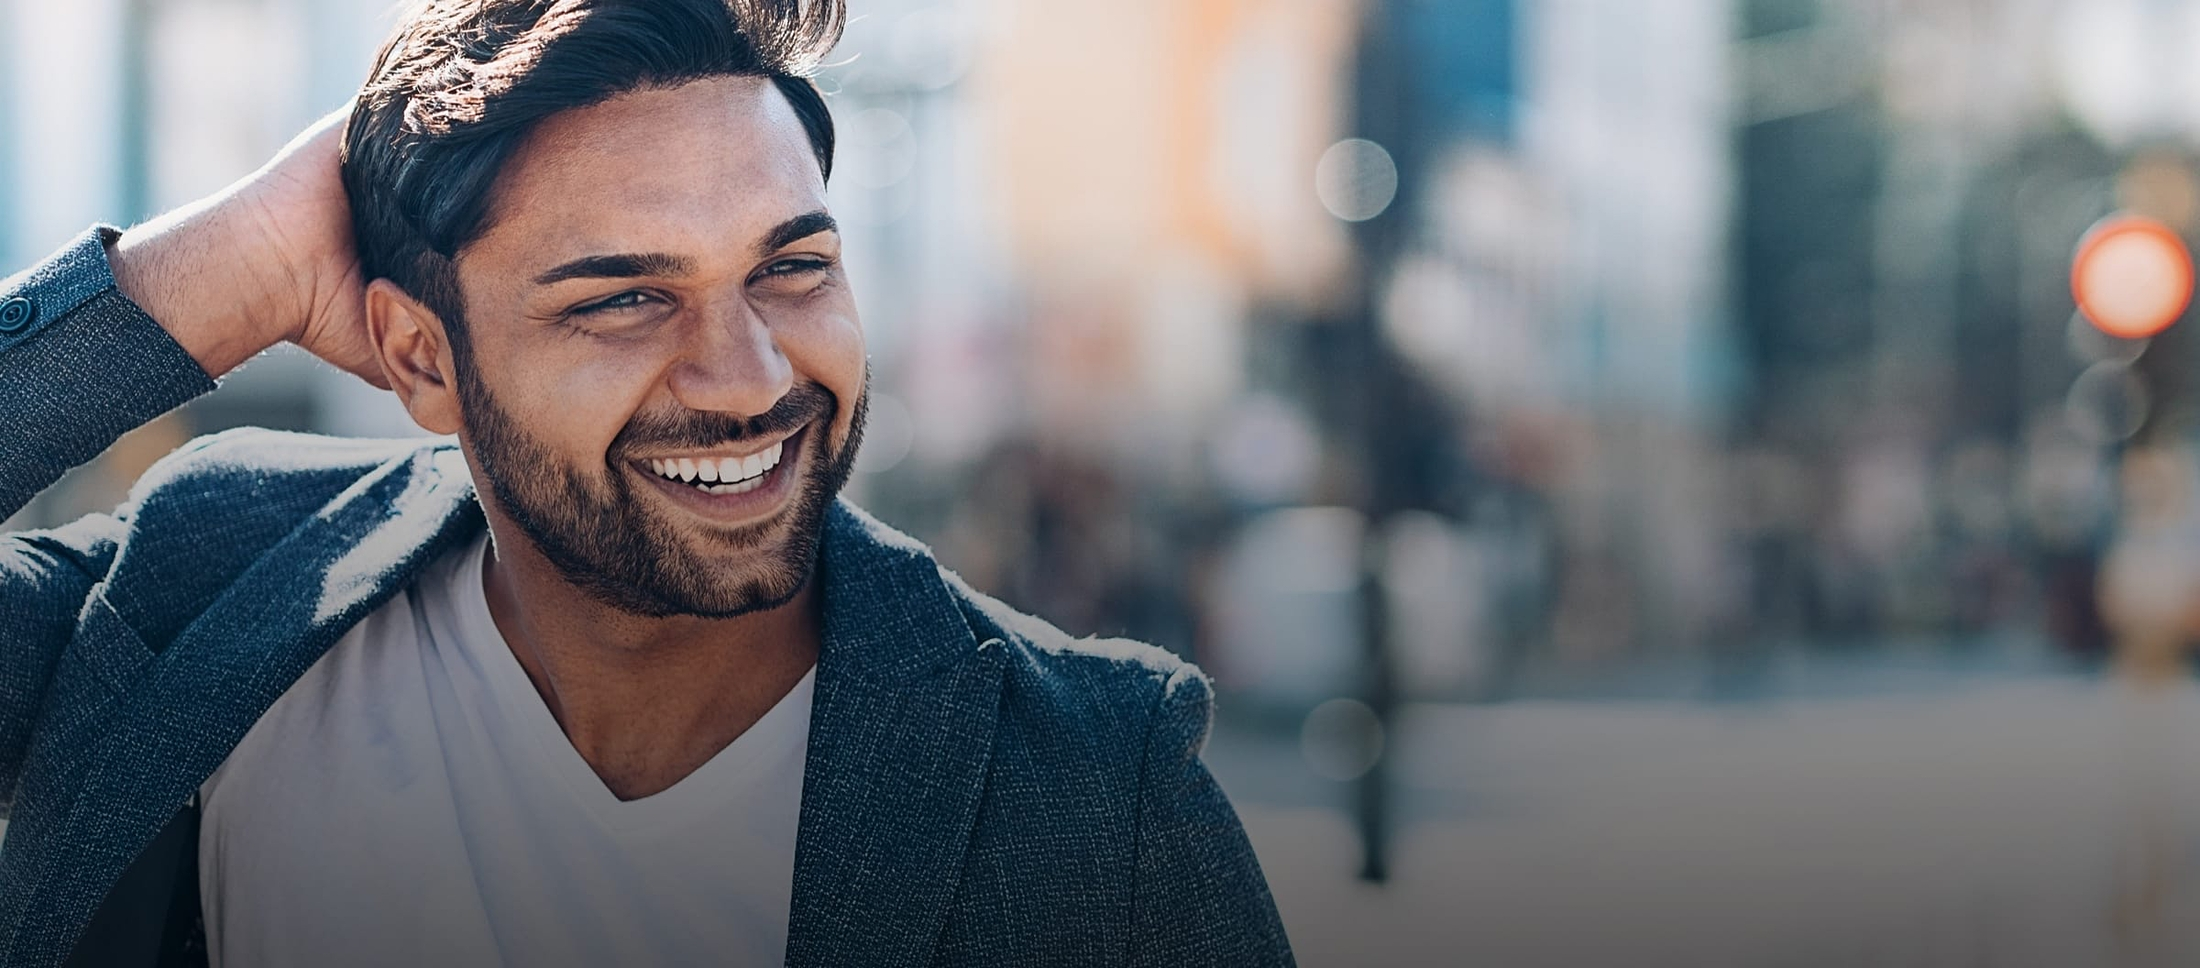 Man smiling outside, running his hand through his hair